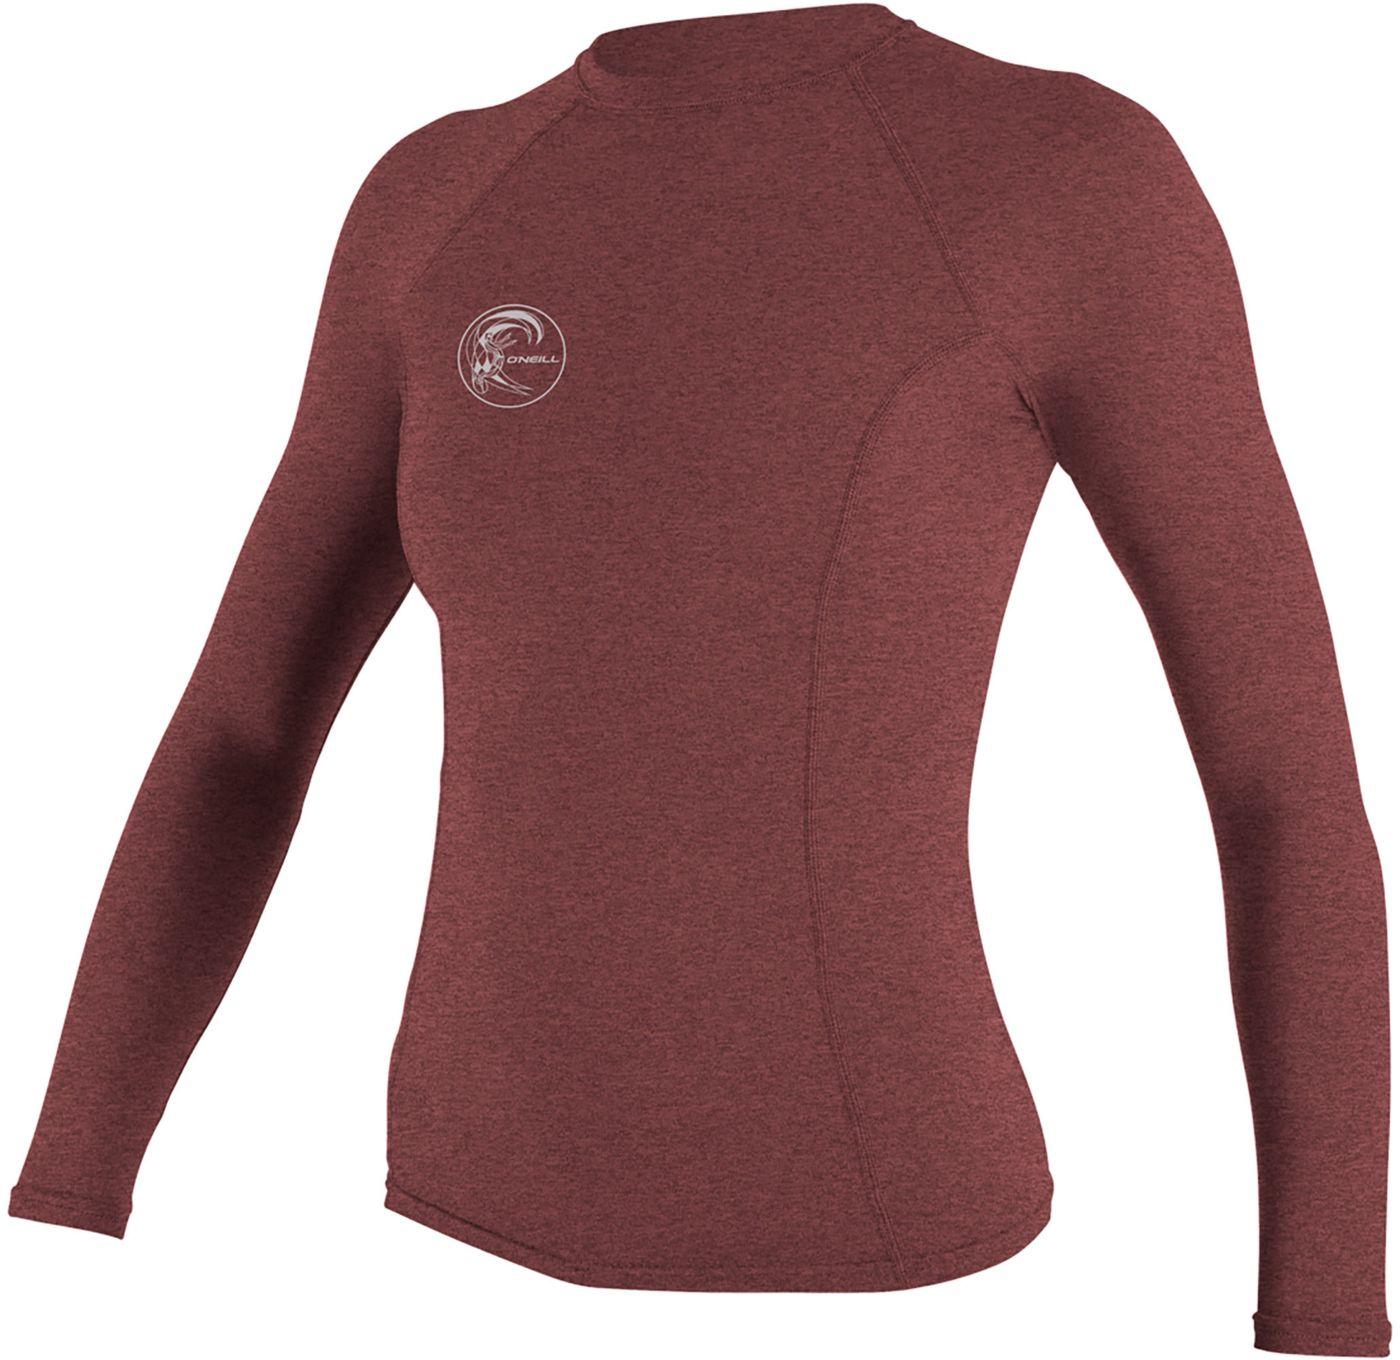 O'Neill Women's Hybrid Long Sleeve Rash Guard